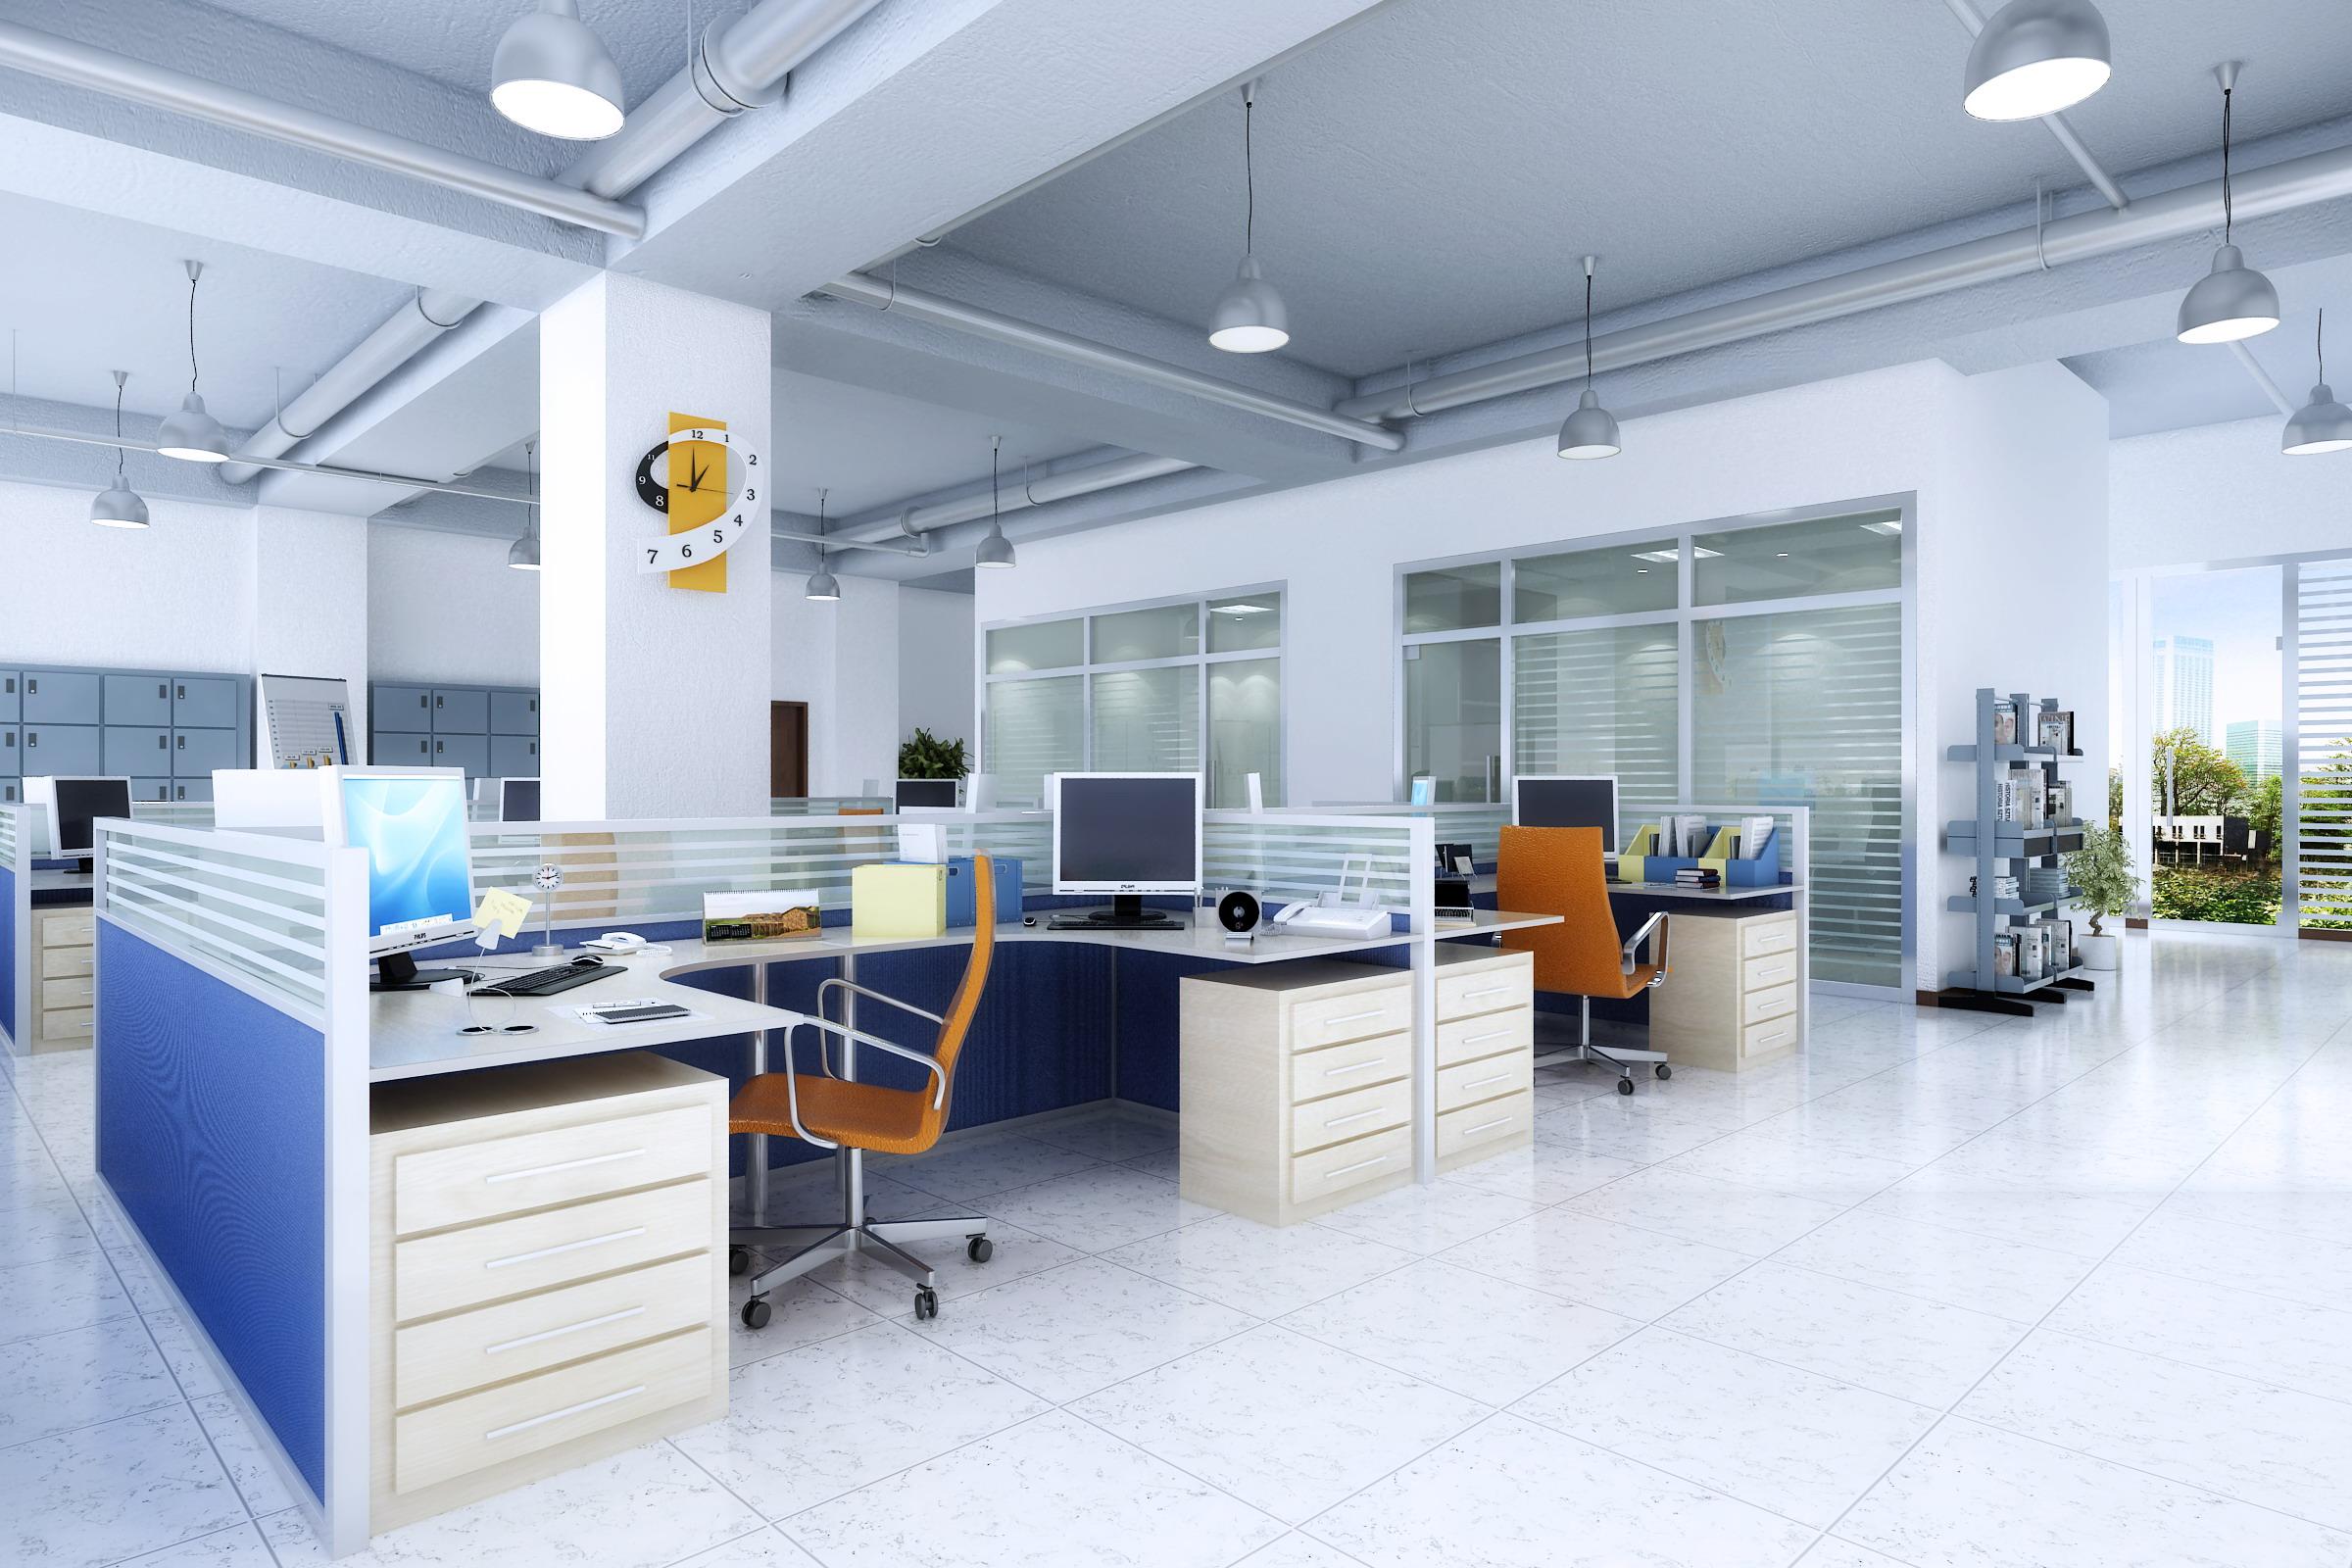 Office 133 3d Model Max 122091